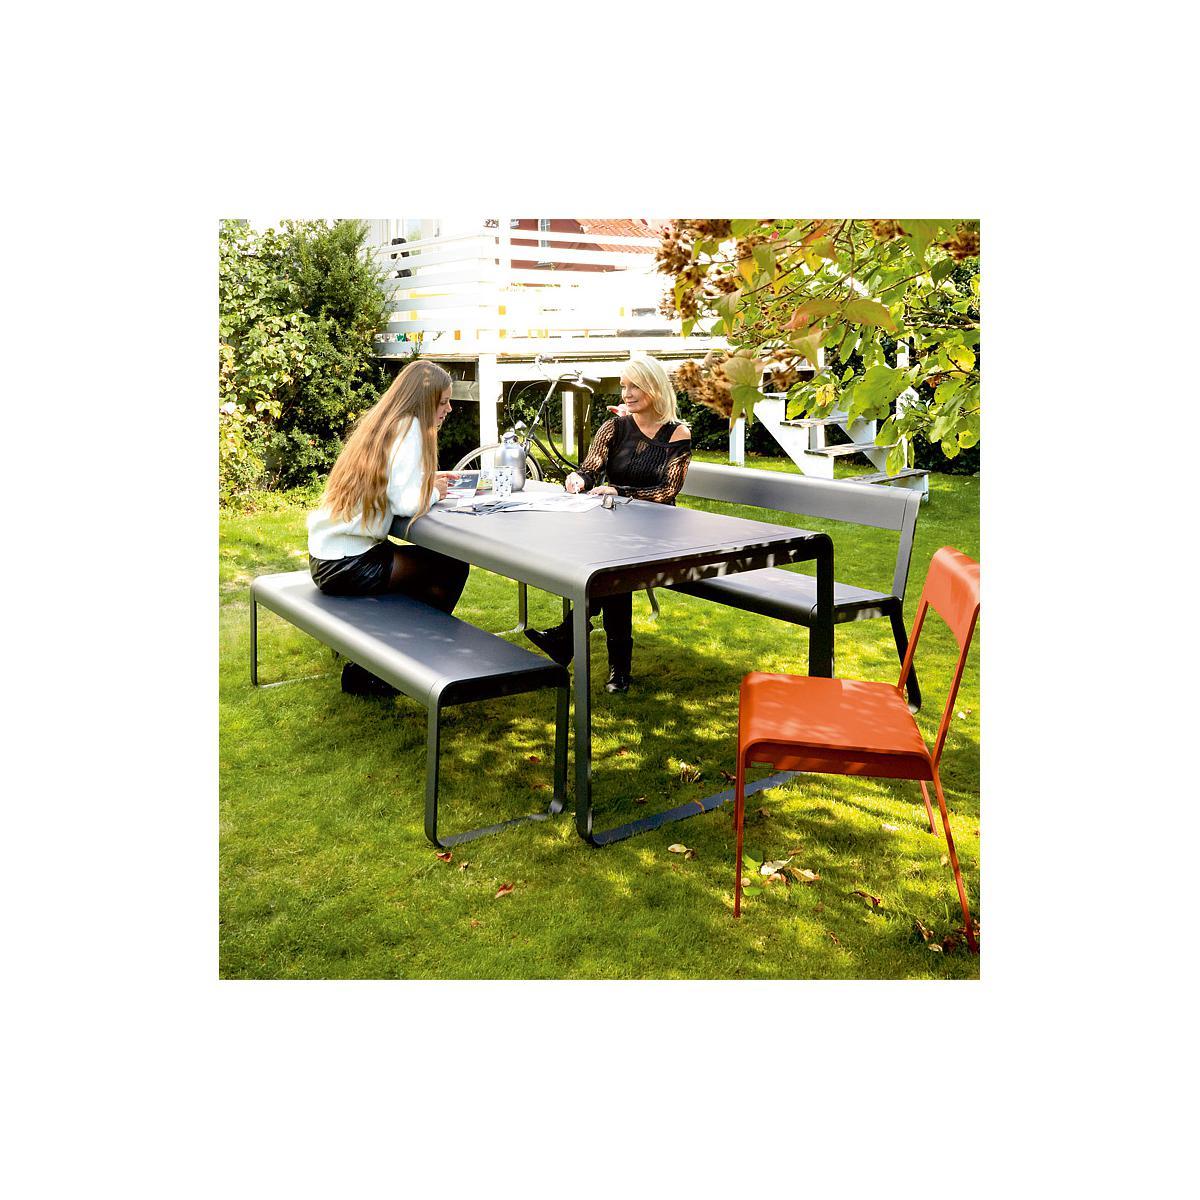 Table de jardin BELLEVIE Fermob cèdre